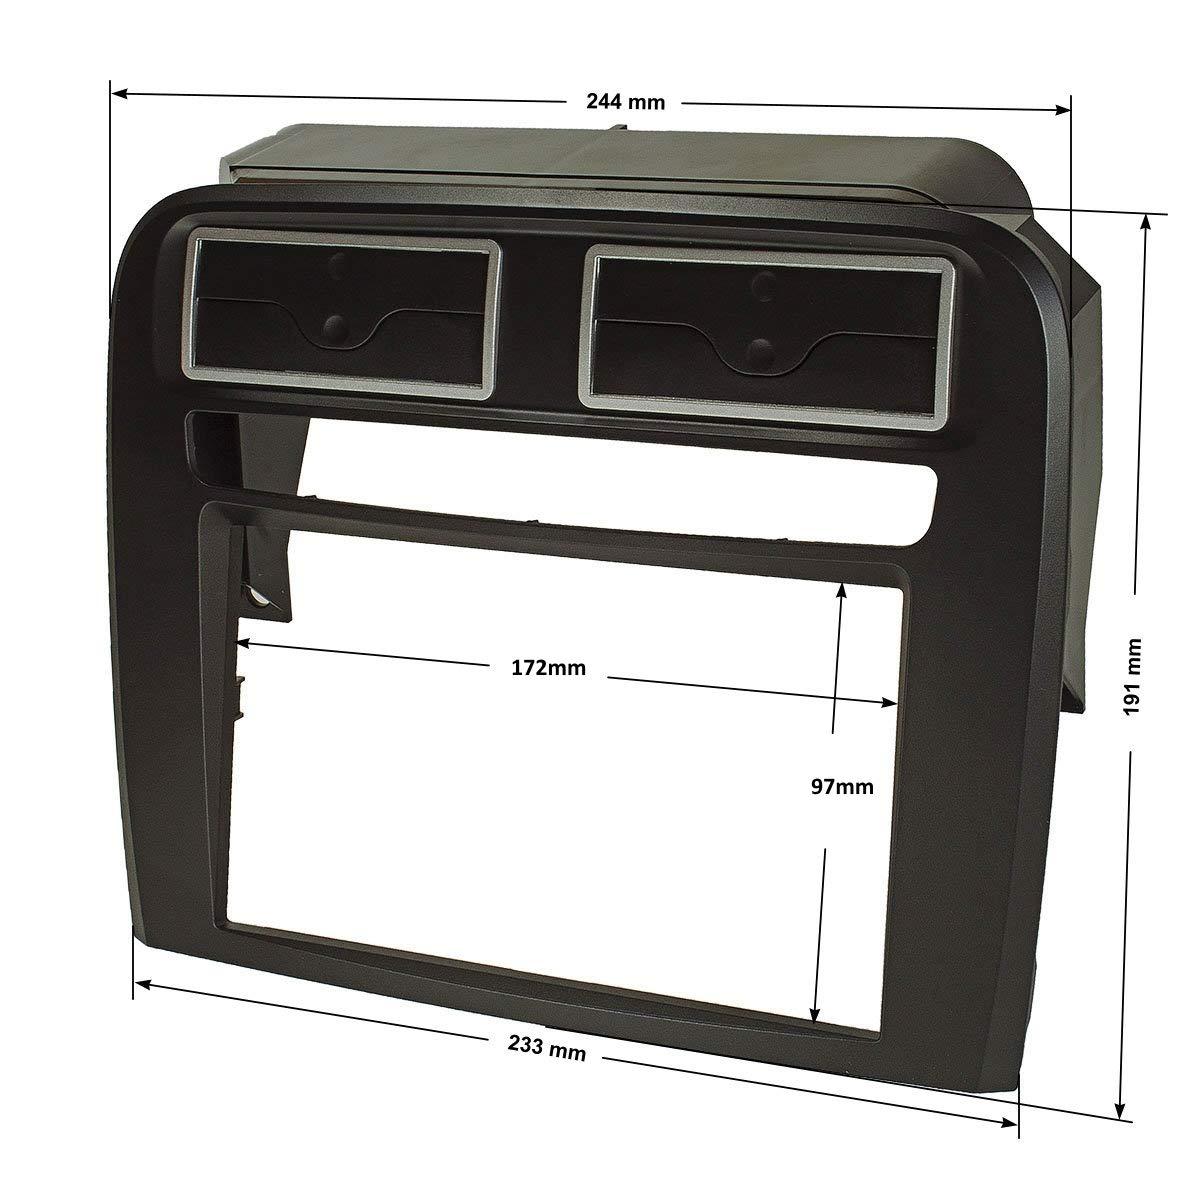 Tomzz 2414/Audio Double DIN Facia Adaptor for Fiat Grande Punto 199/2005-2009, Black